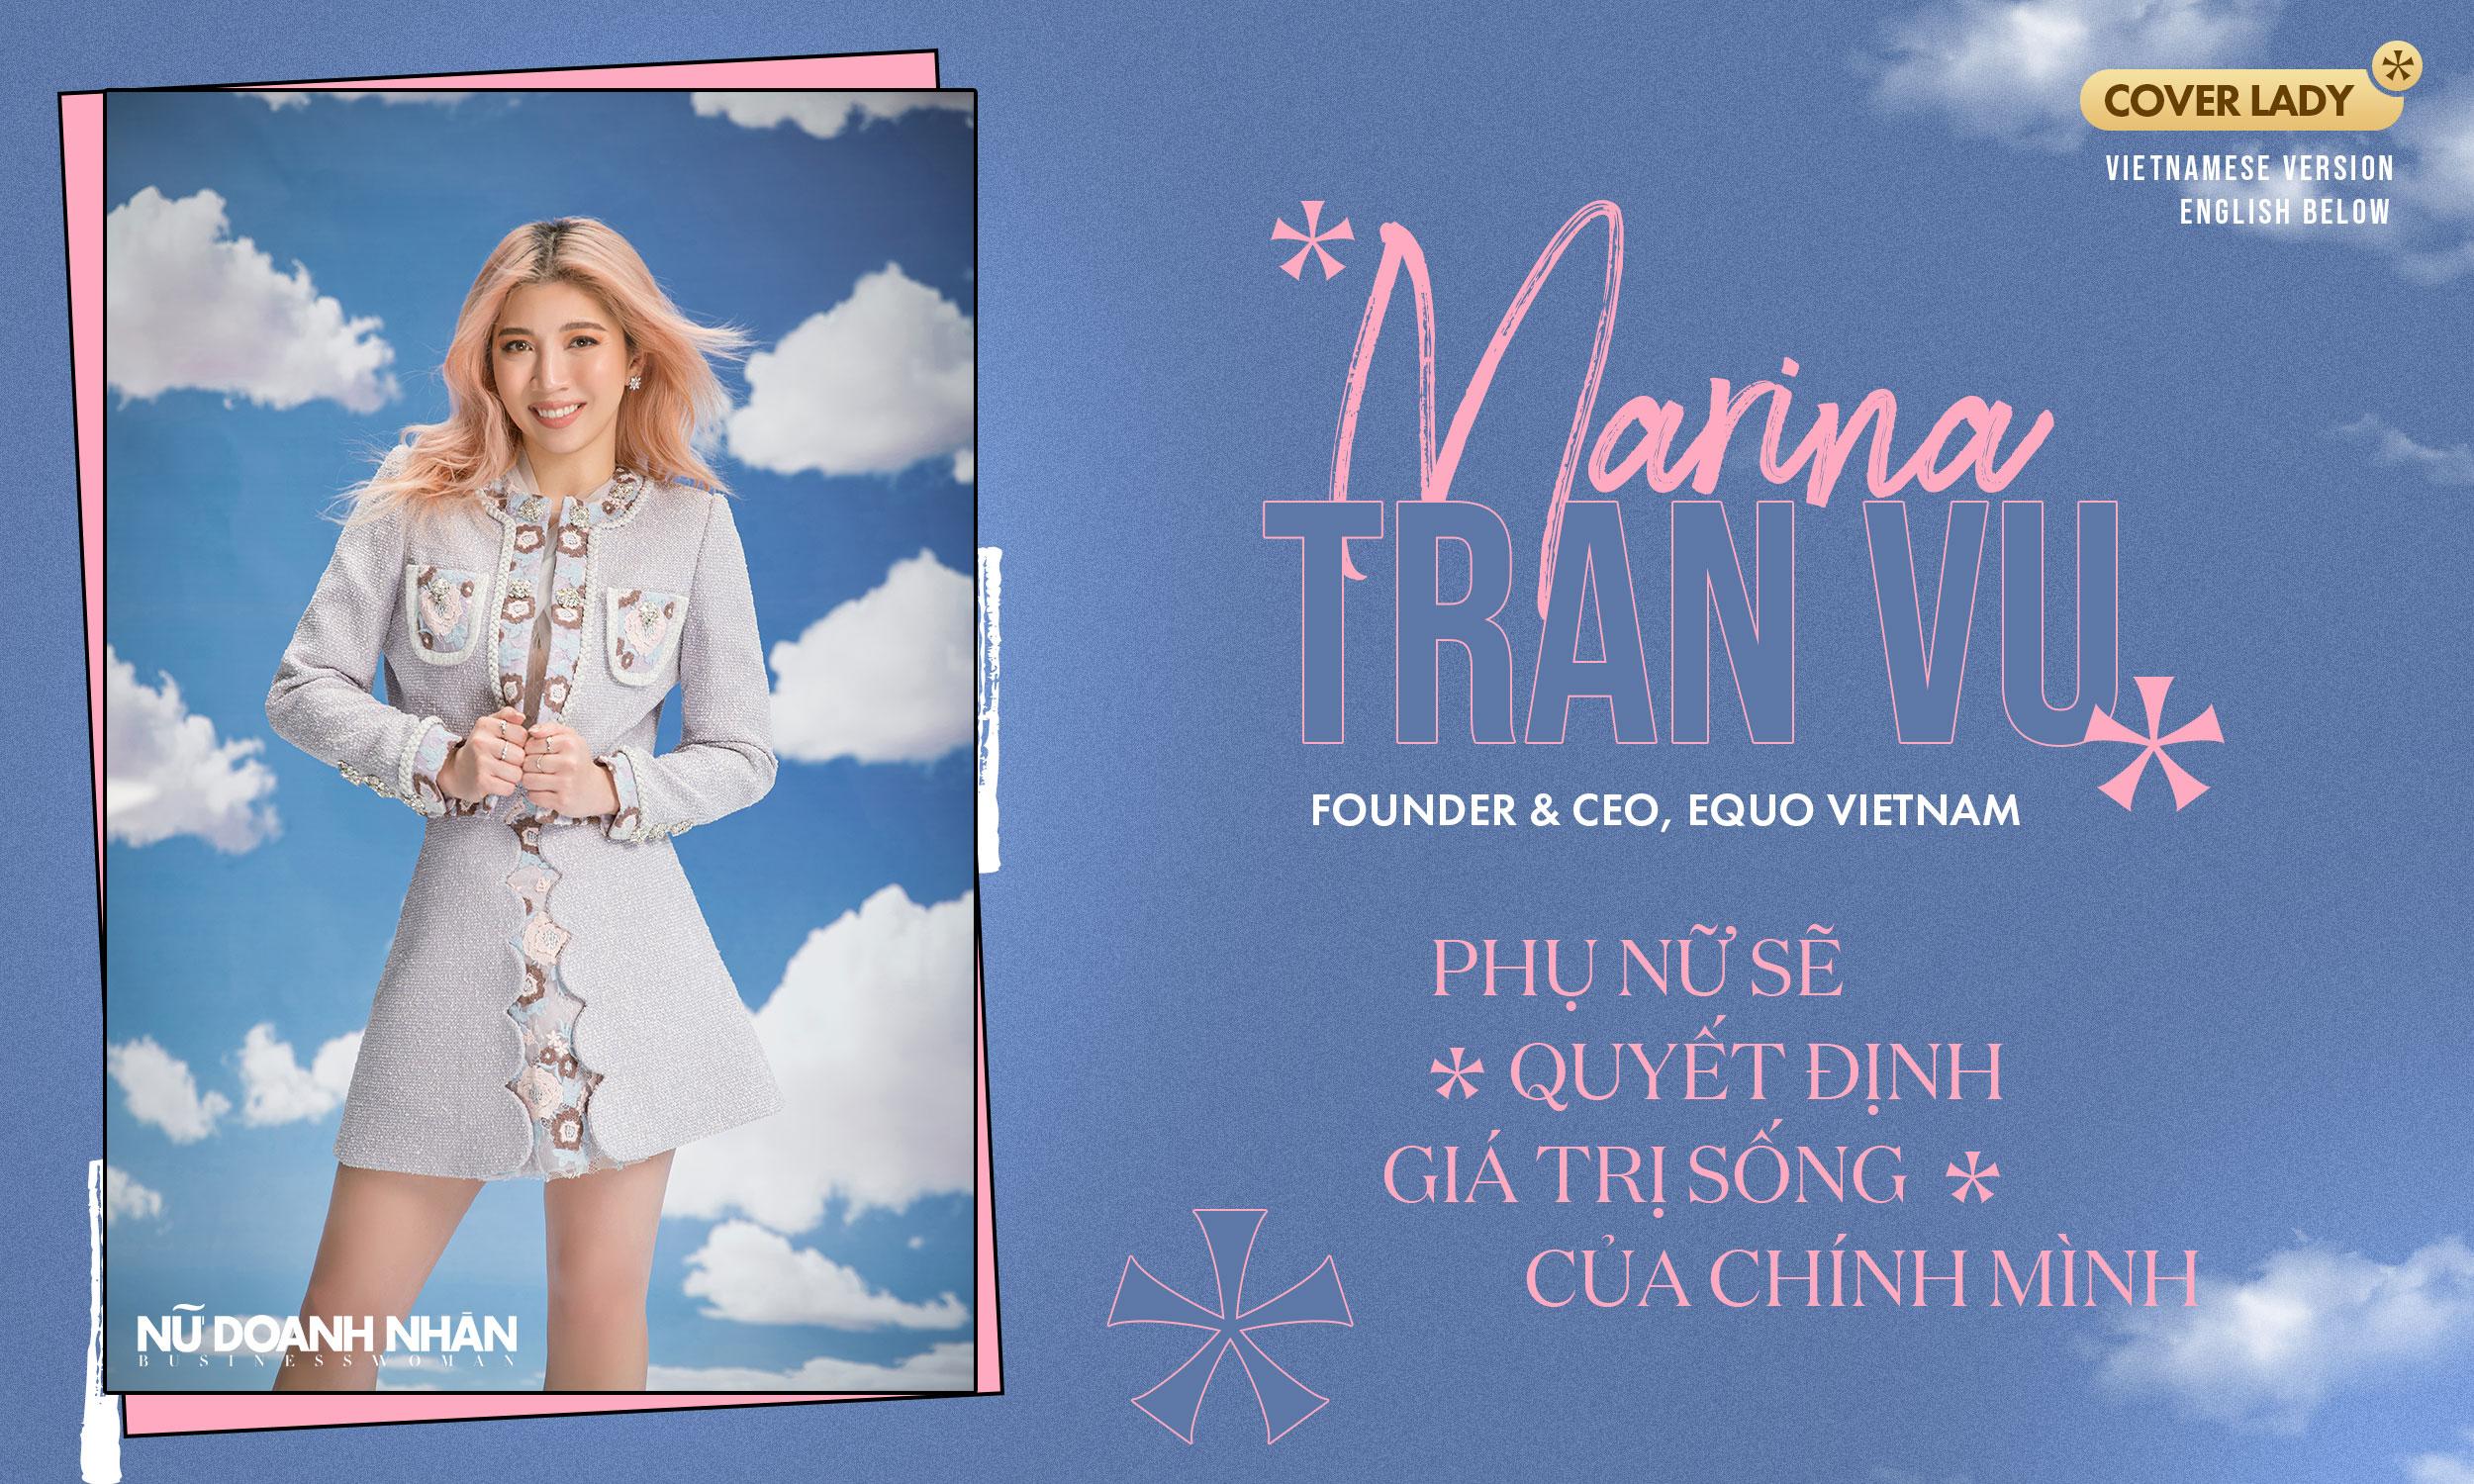 phỏng vấn Marina Tran Vu - CEO & FOUNDER EQUO VIETNAM